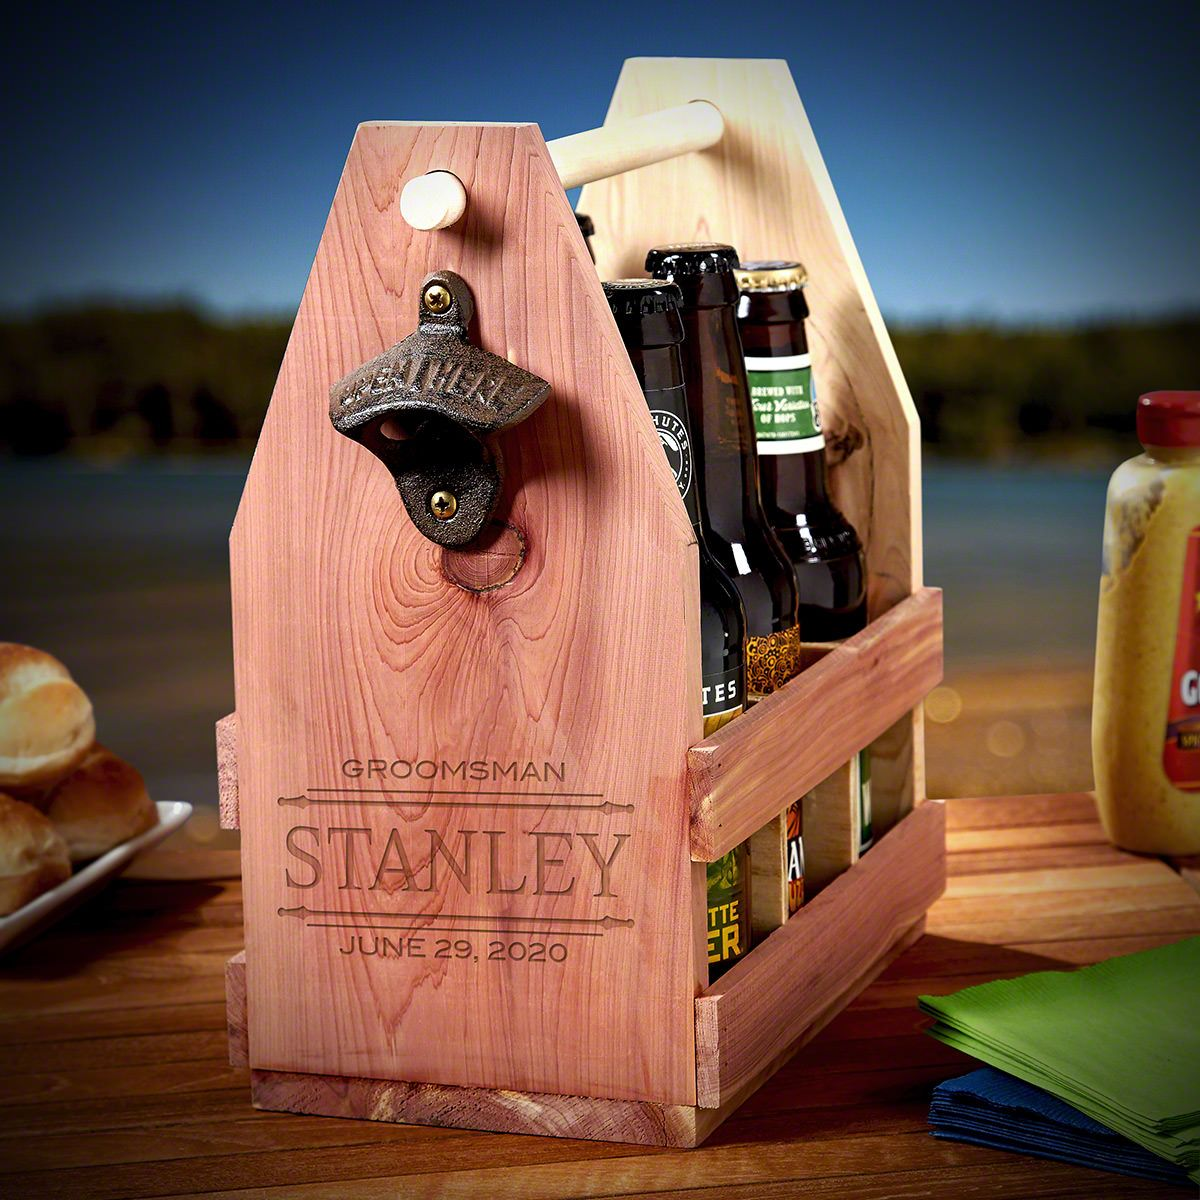 Stanford Custom Wooden Beer Caddy – Gift for Groomsmen